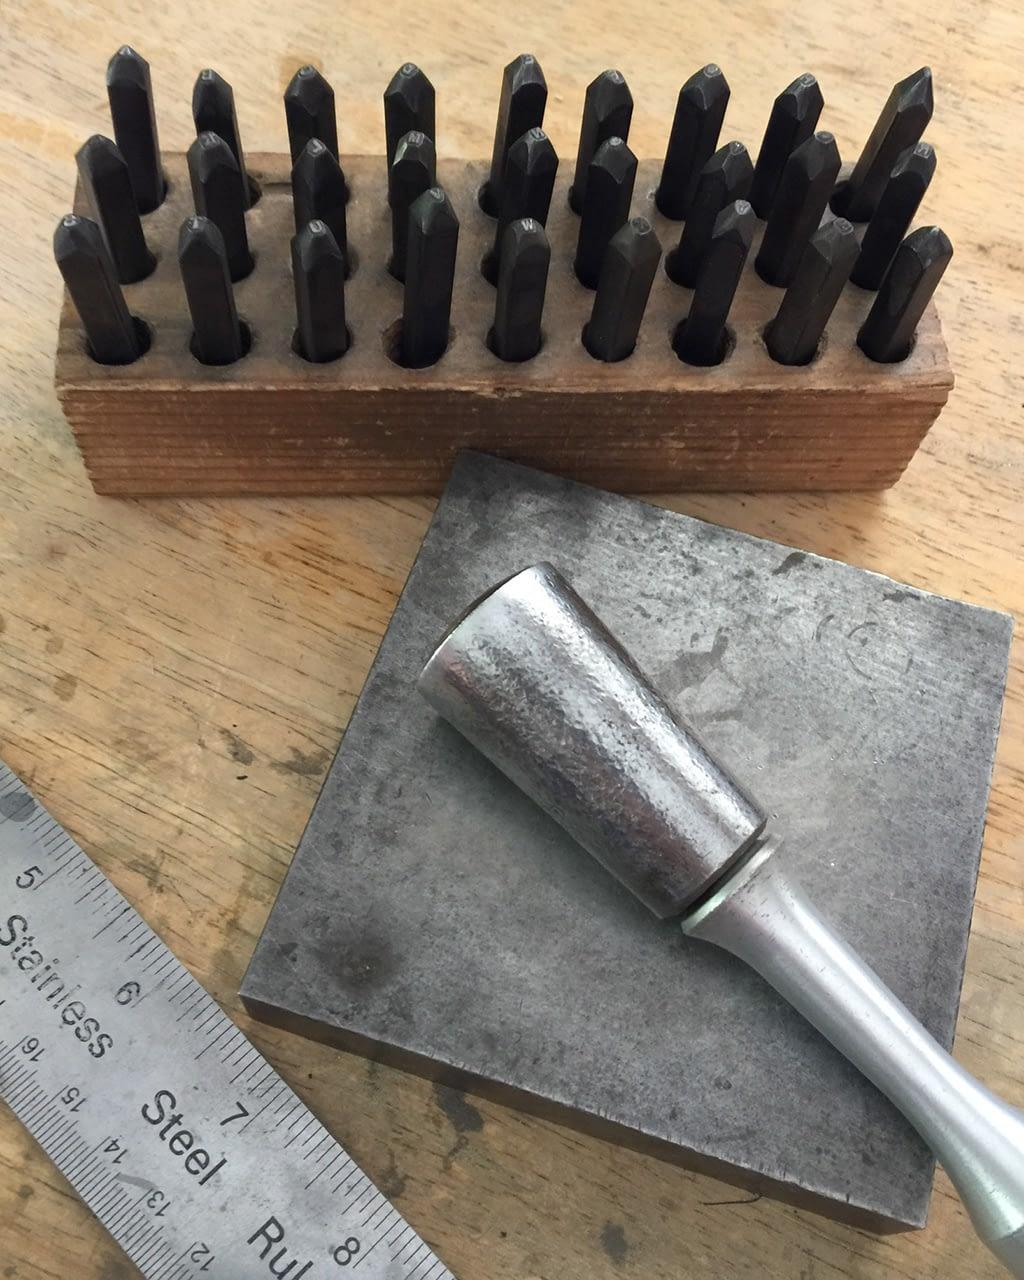 Elisa Saucy's jewelry tools gemstone setters